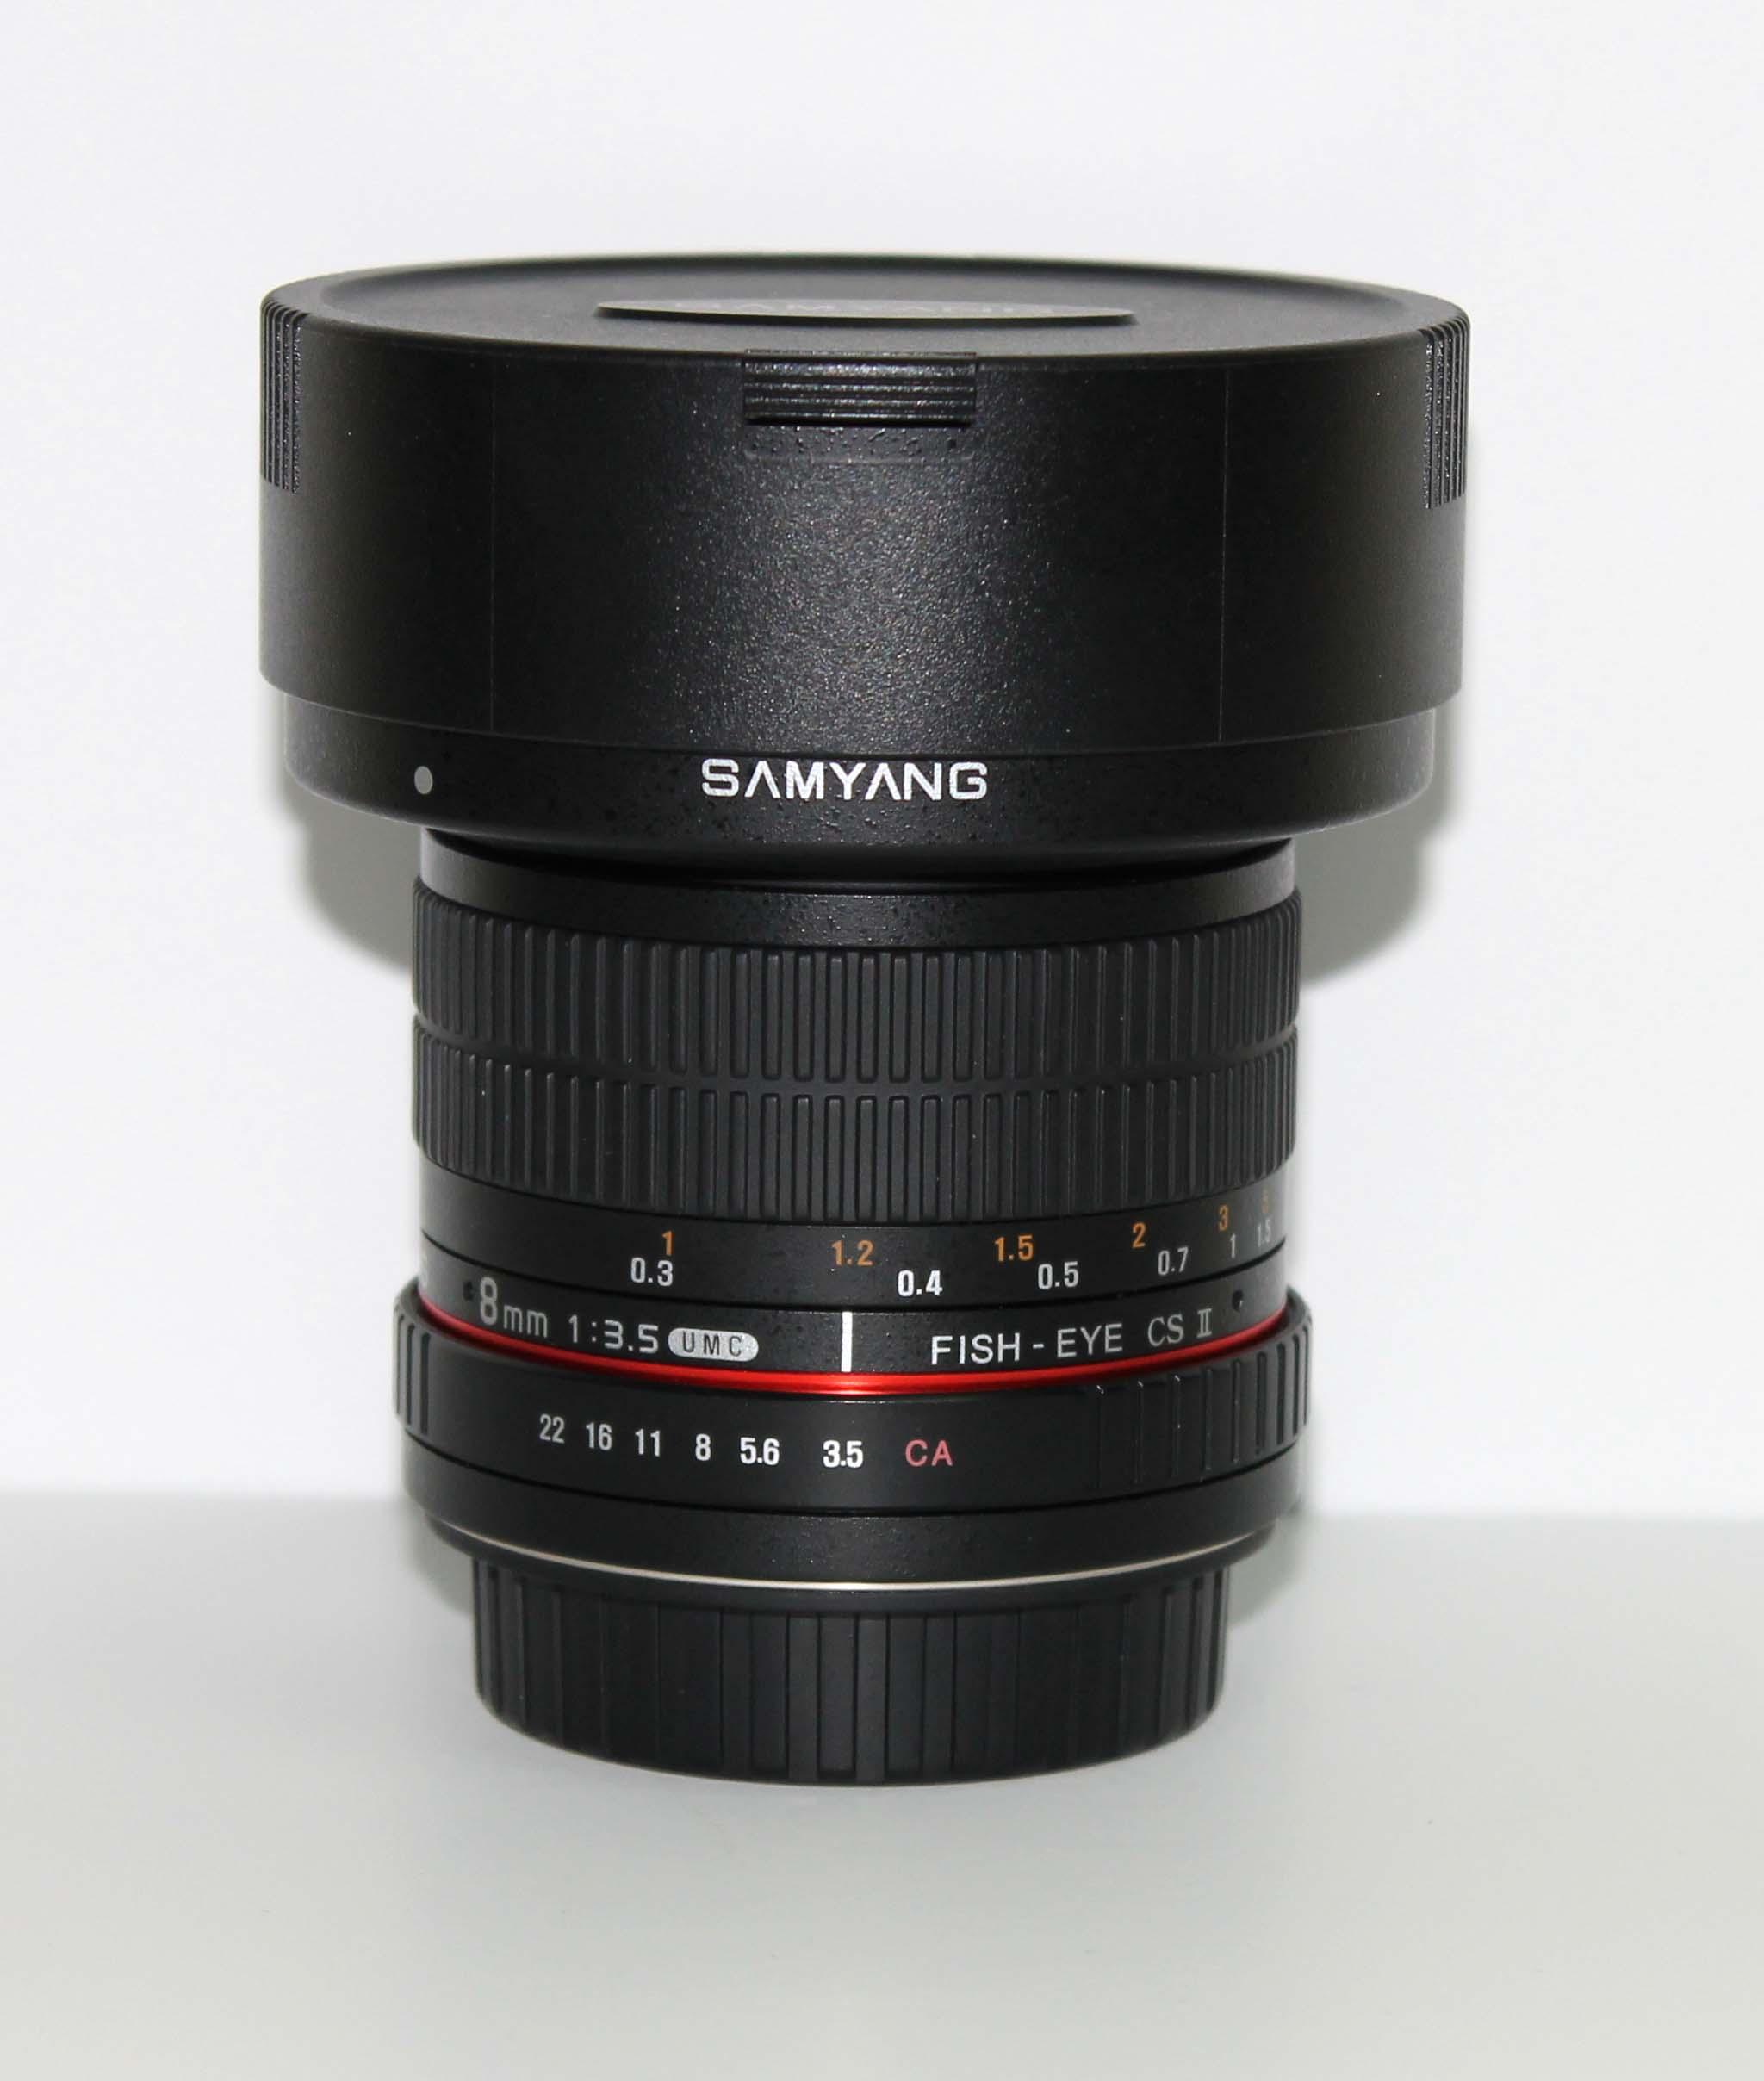 Объектив Samyang 8 mm F/3.5 AS IF USM Fish-eye CS || for Canon